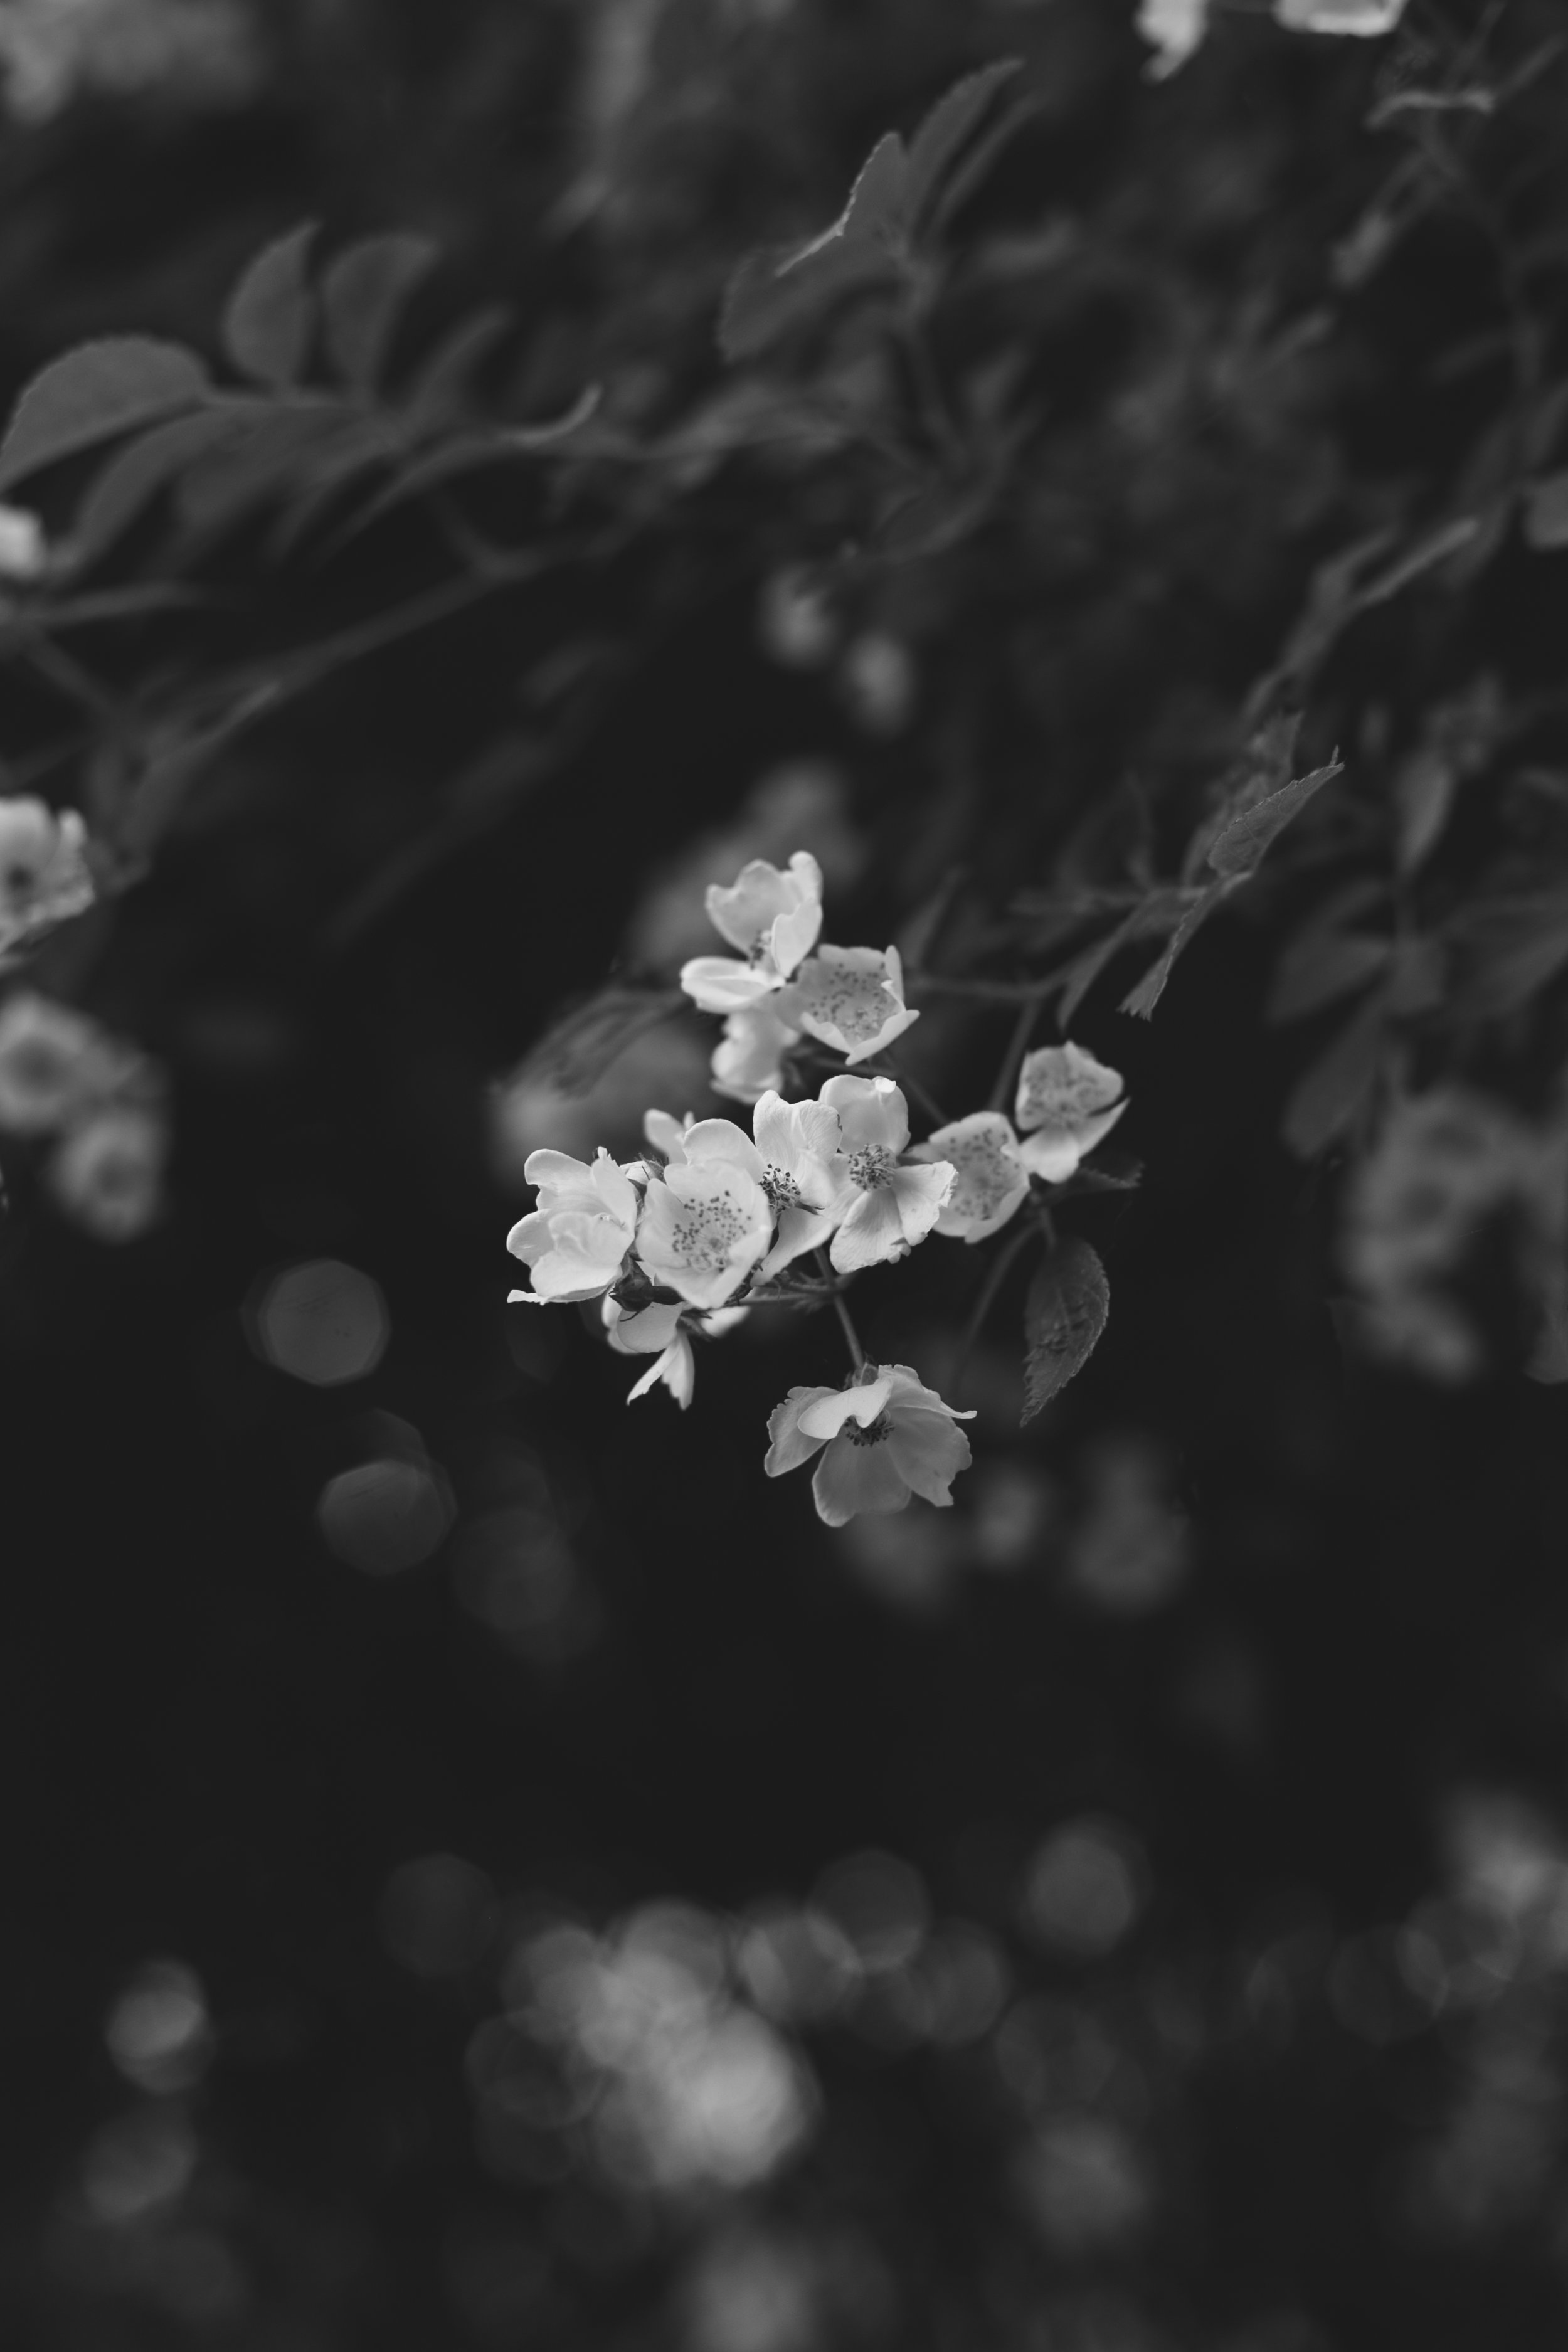 b&w flowers 2.jpg